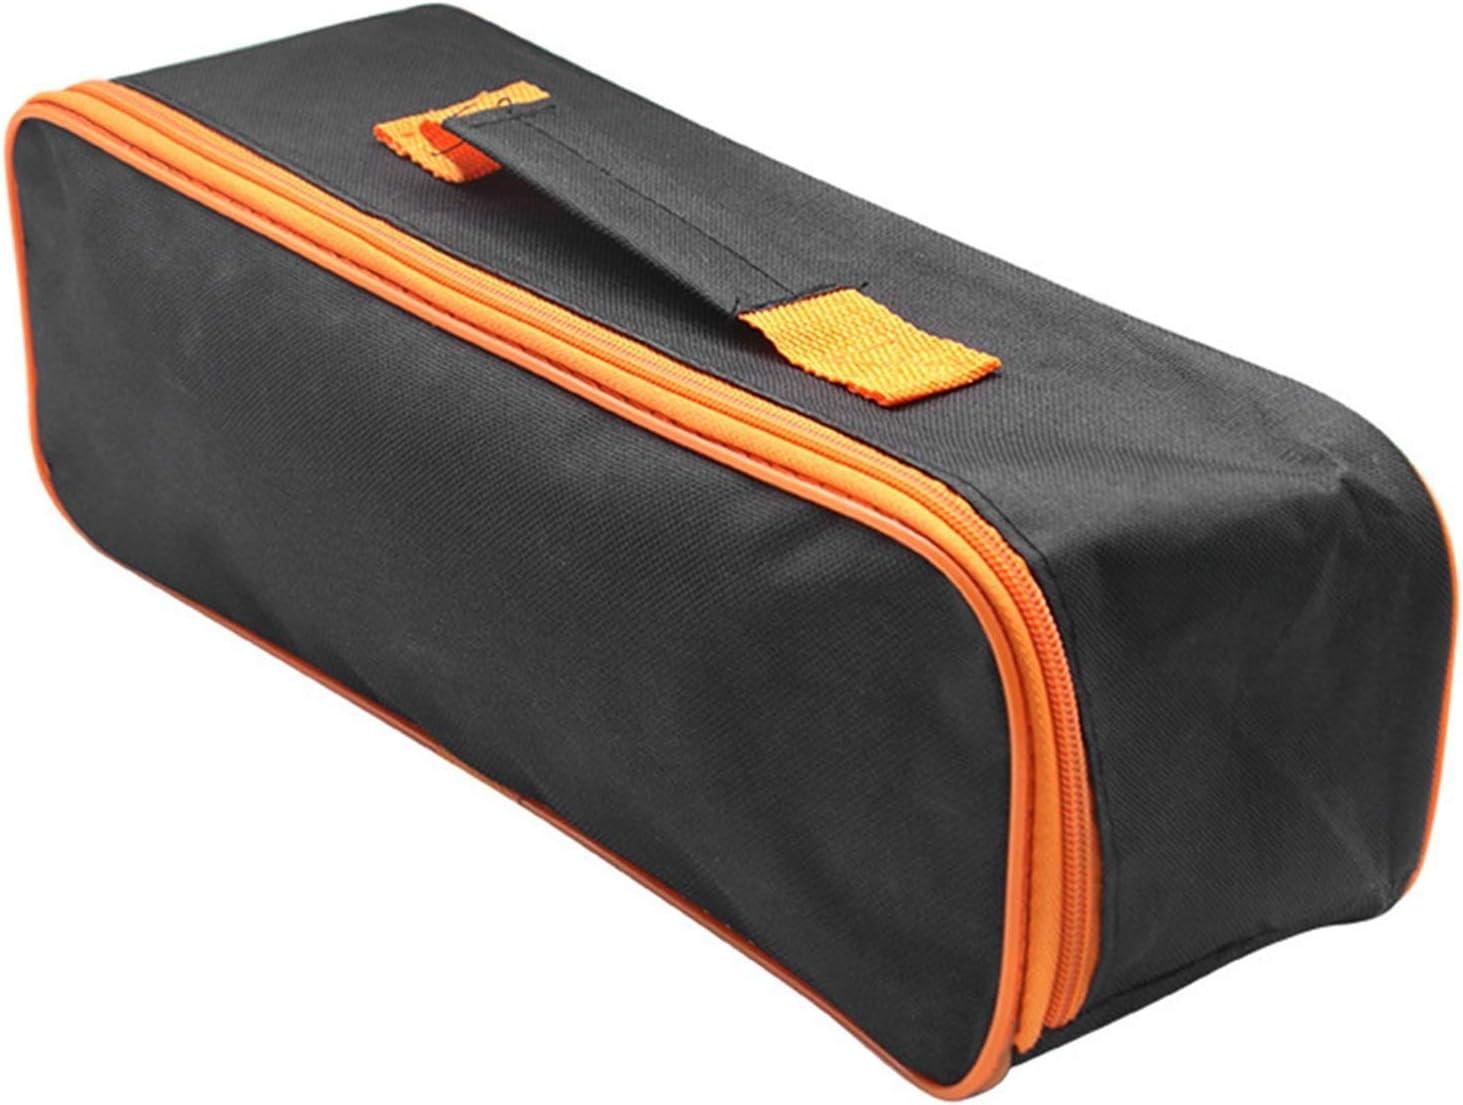 JKXWX Tool Bag Zipper Closure Tool Bags,Electrician Toolbag with